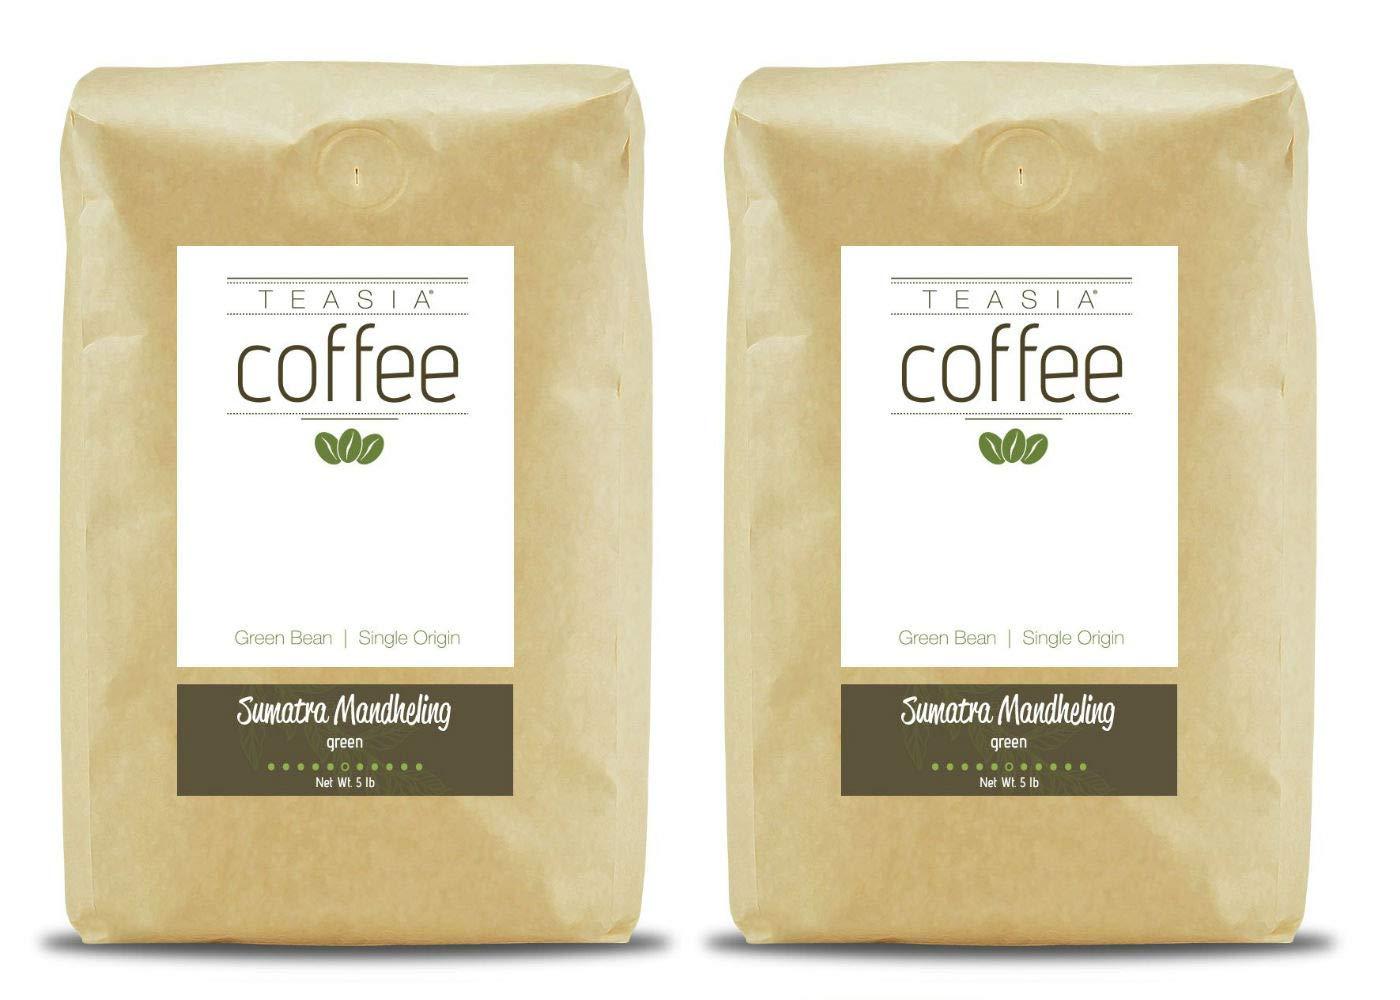 Teasia Coffee, Sumatra Mandheling, 2-Pack, Single Origin Fair Trade, Green Unroasted Whole Coffee Beans, 5-Pound Bag